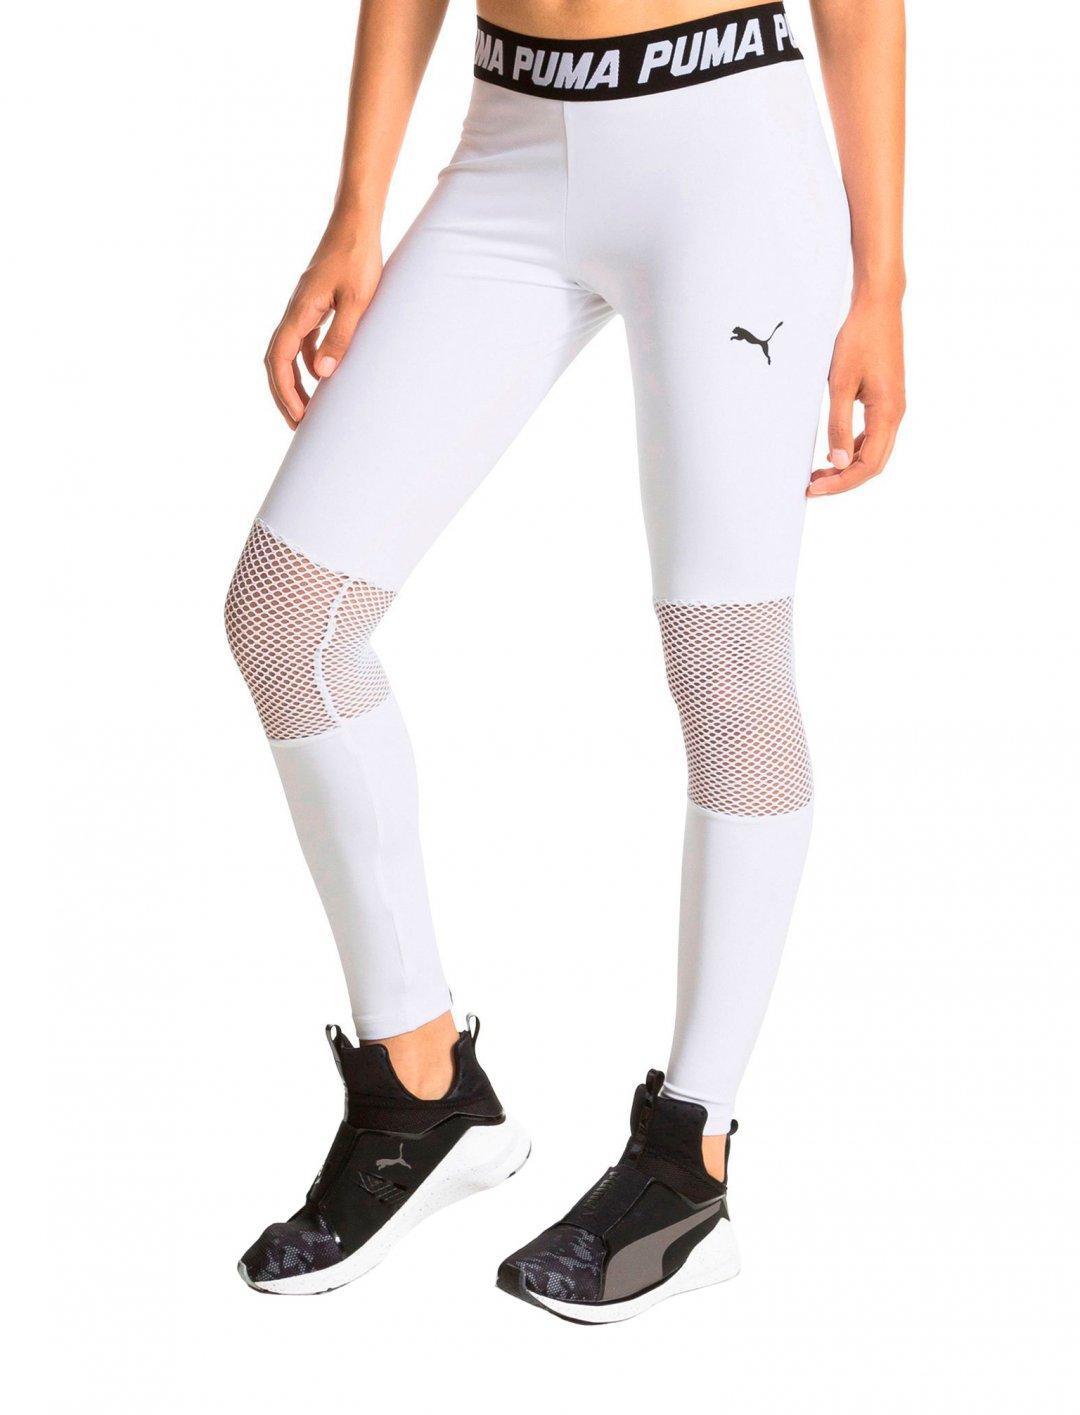 "Pumas Mesh Leggings {""id"":5,""product_section_id"":1,""name"":""Clothing"",""order"":5} Puma"